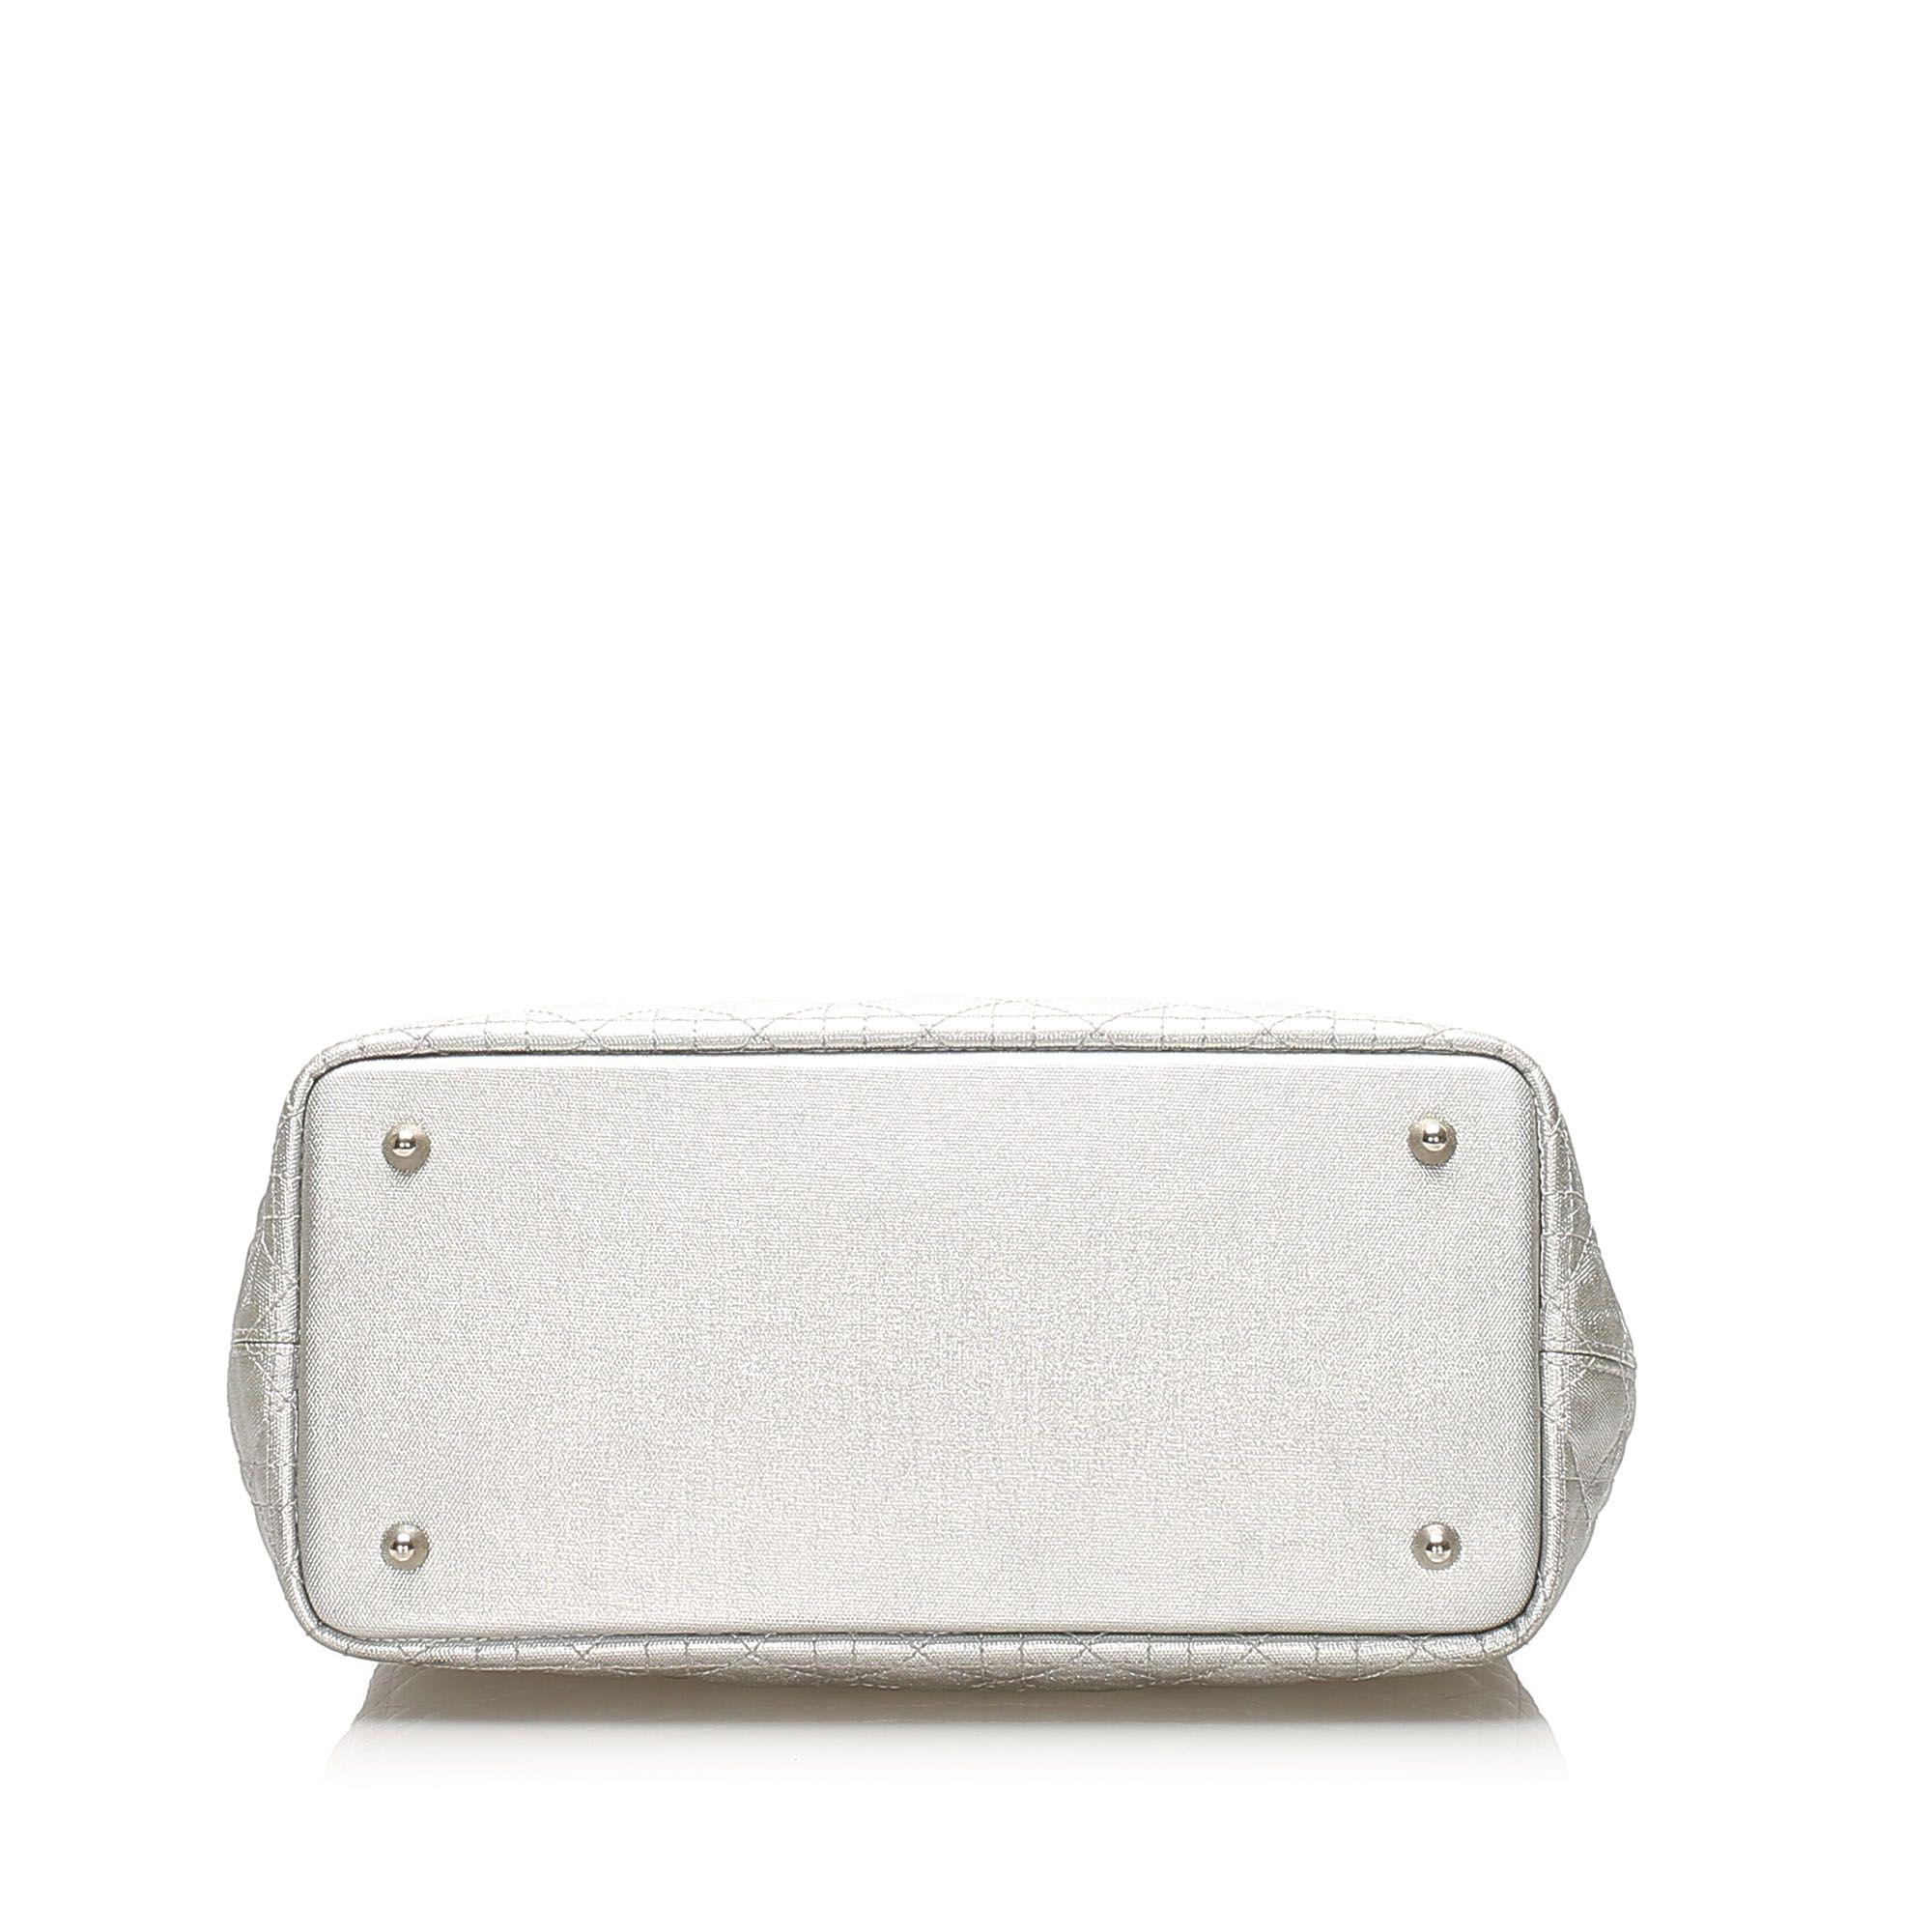 Vintage Dior Cannage Panarea Coated Canvas Tote Bag Silver